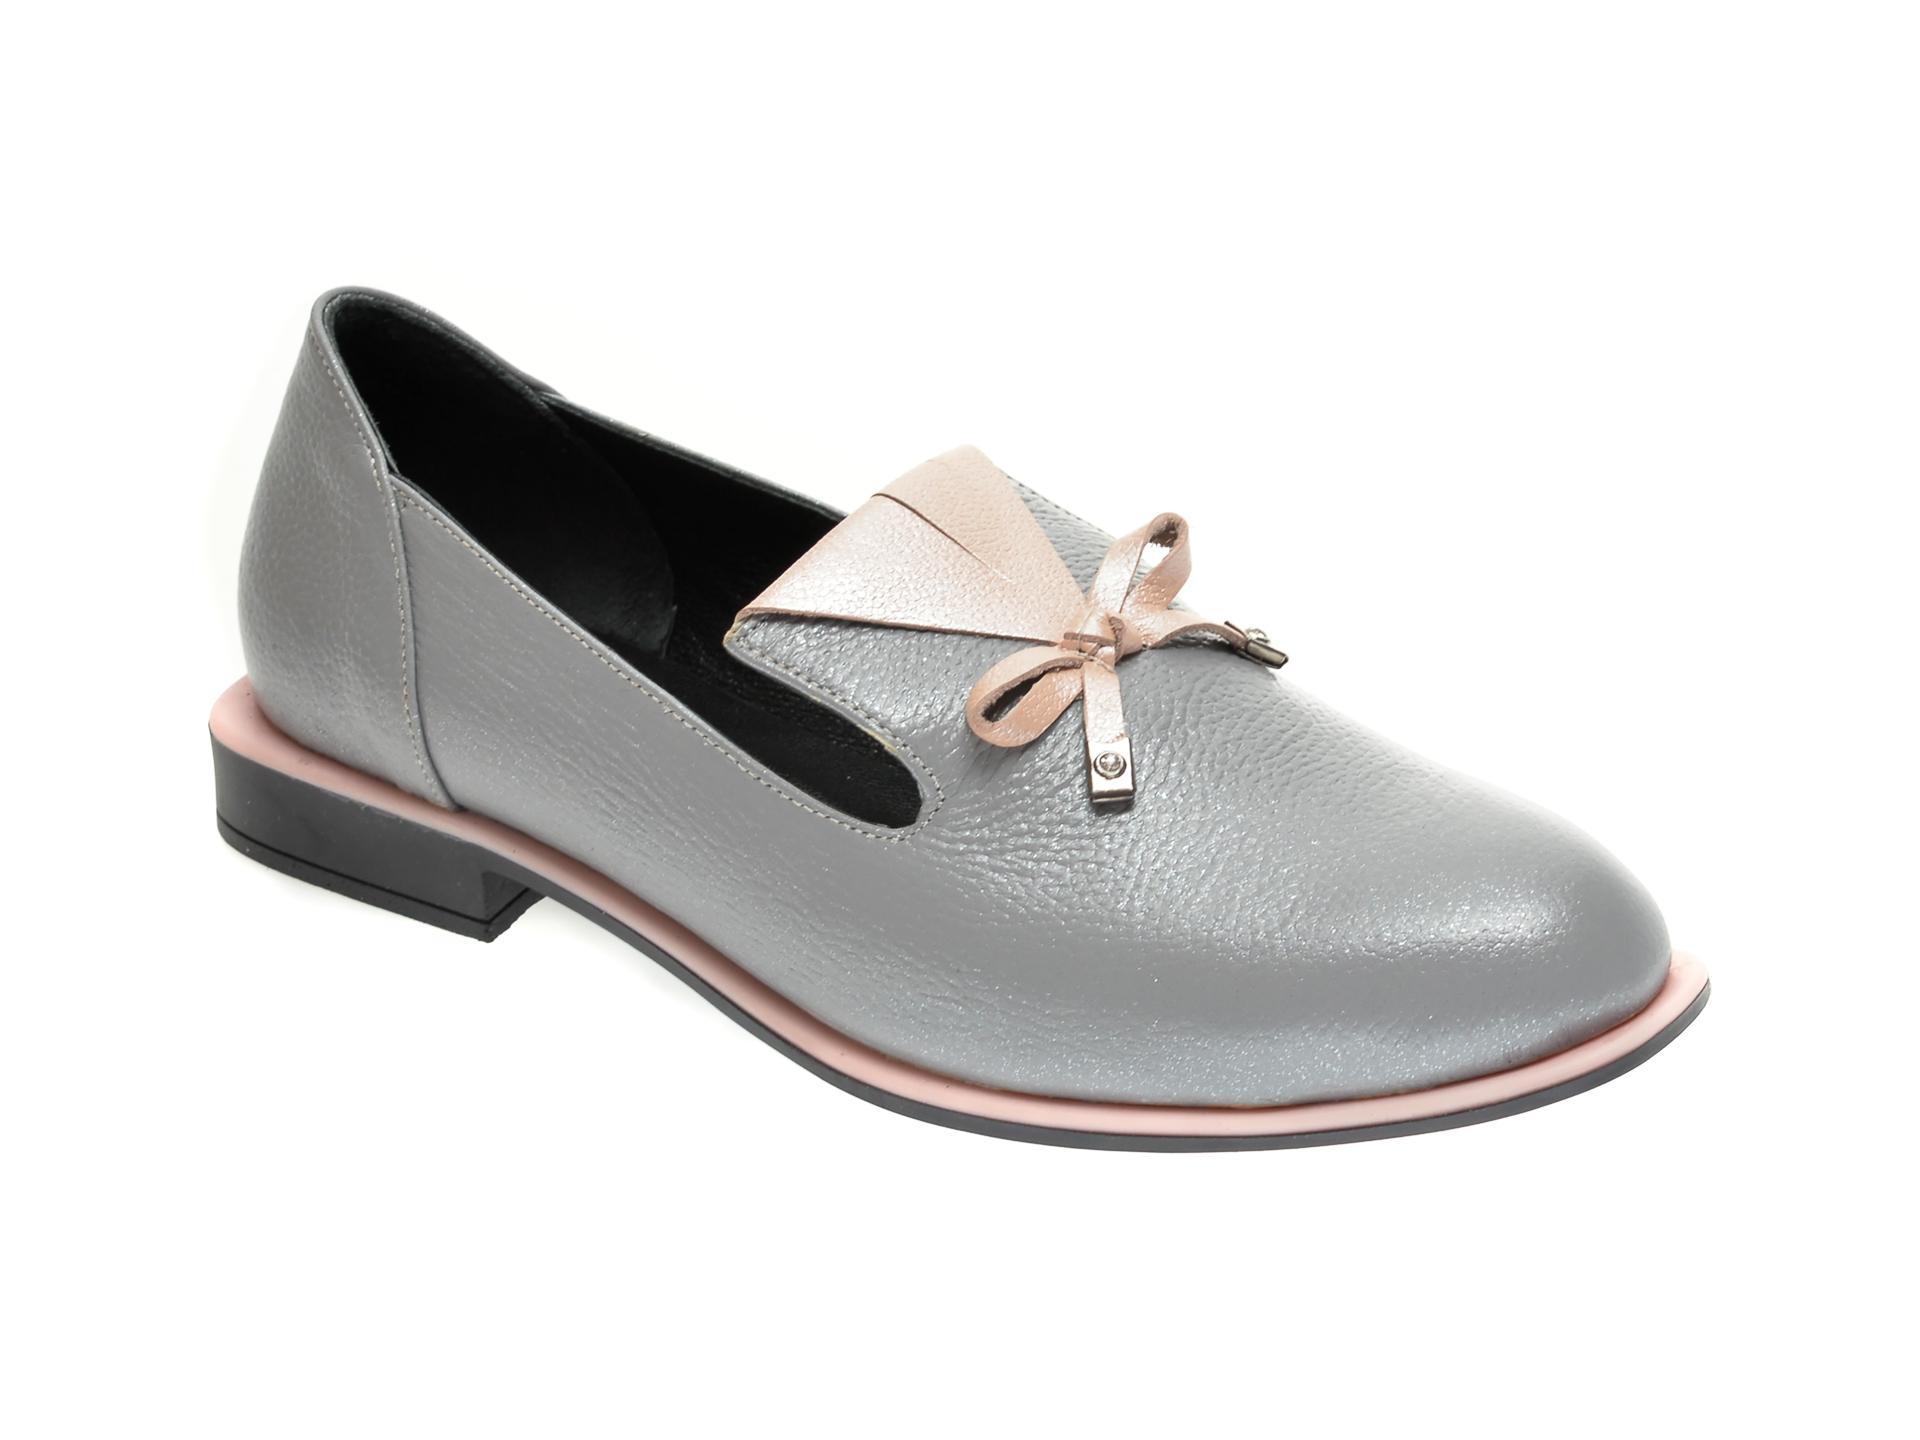 Pantofi Flavia Passini Gri, 372029, Din Piele Naturala